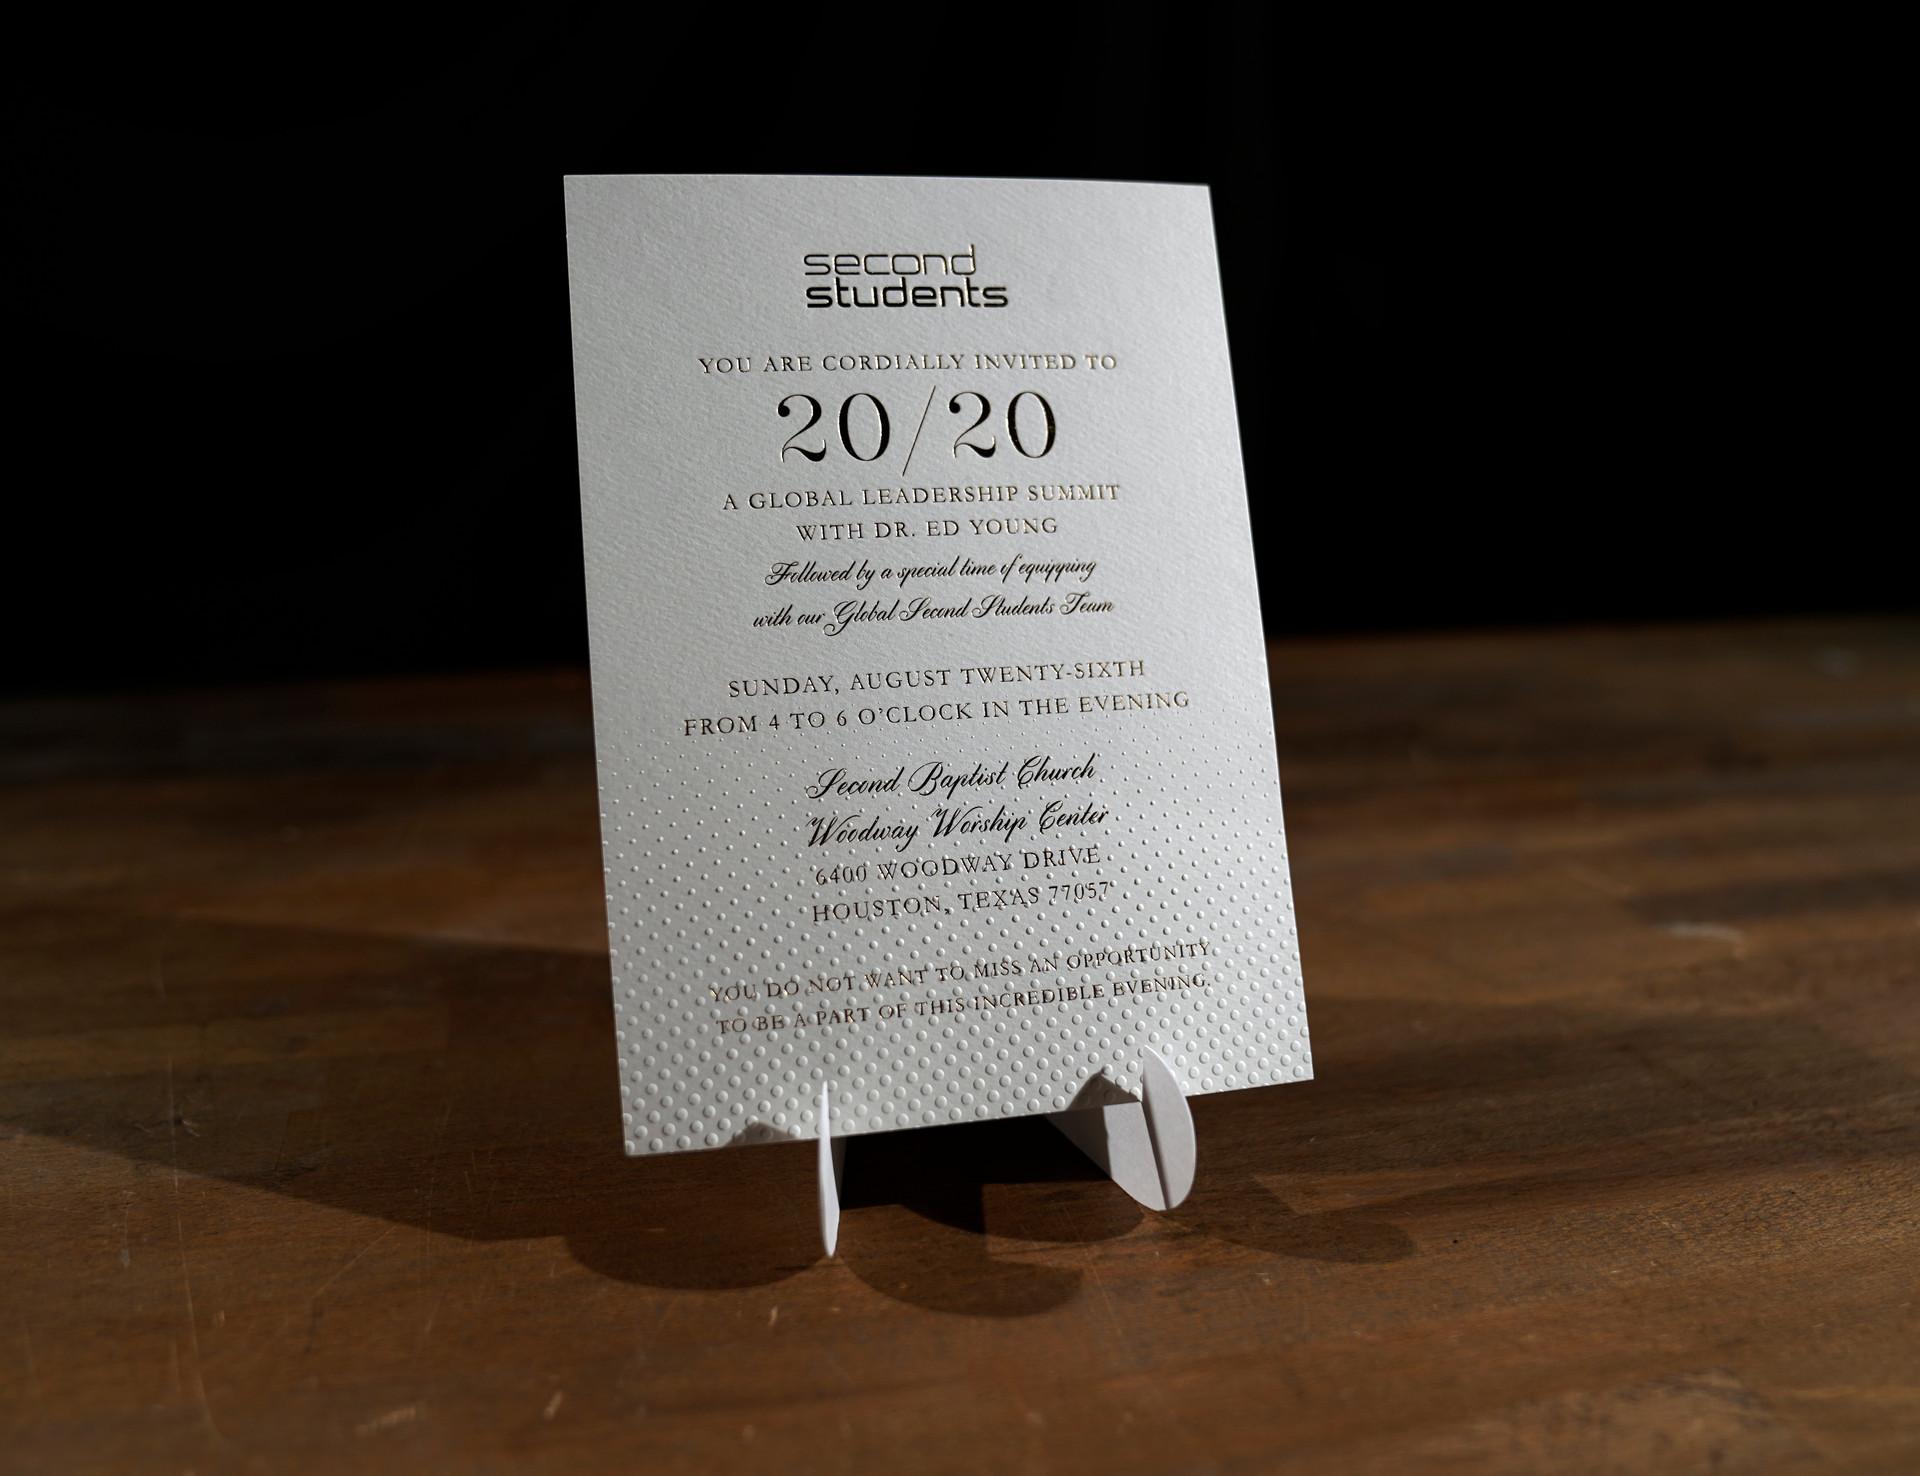 Second Students Vision 20/20 Invitation